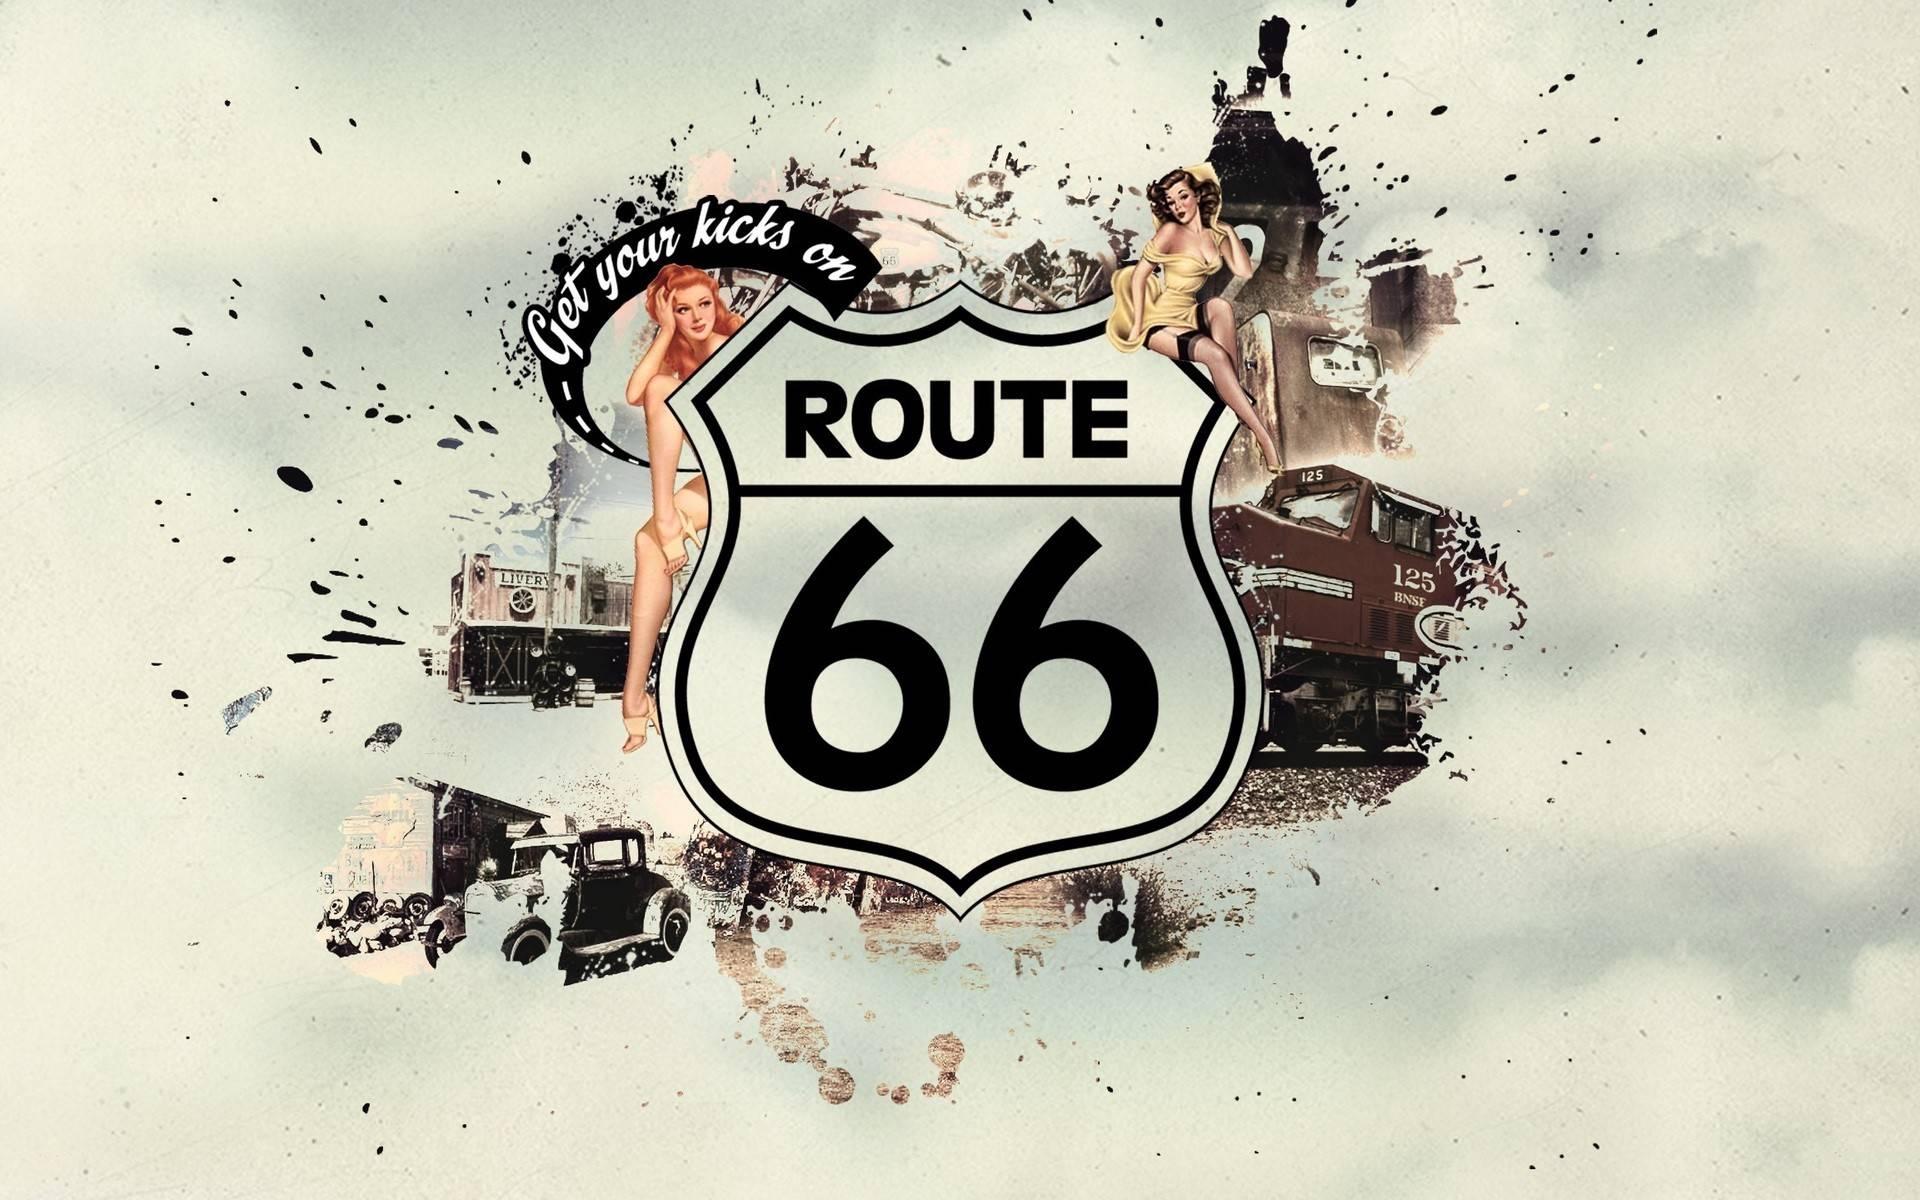 Route 66 19201200 Wallpaper 1673800 1920x1200